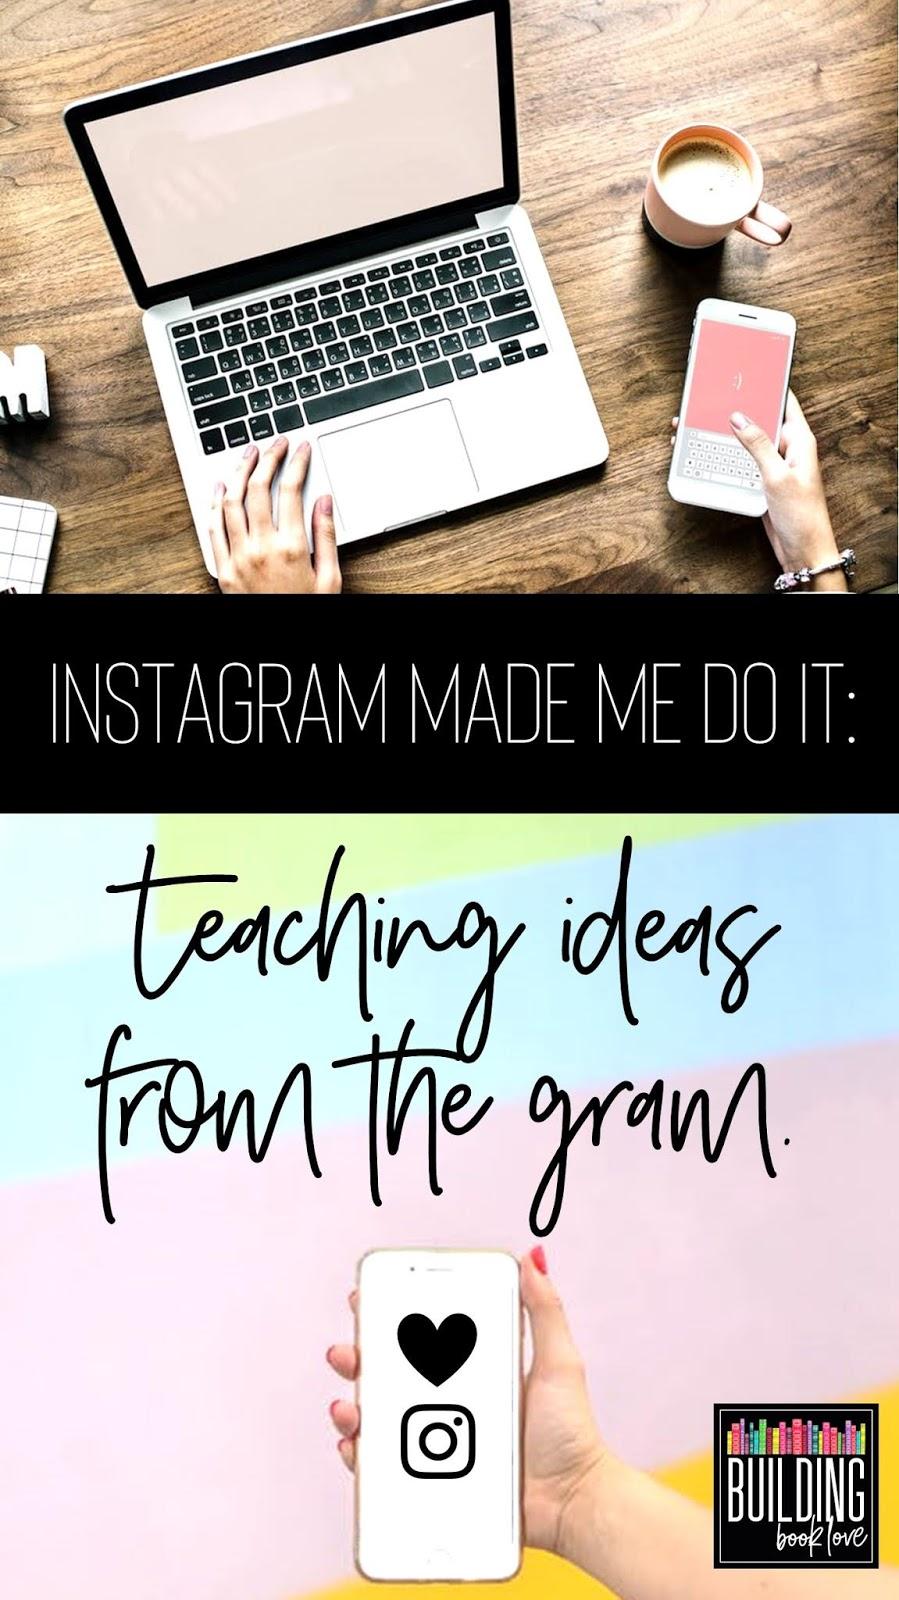 Building Book Love : Instagram Made Me Do It: Teaching ideas